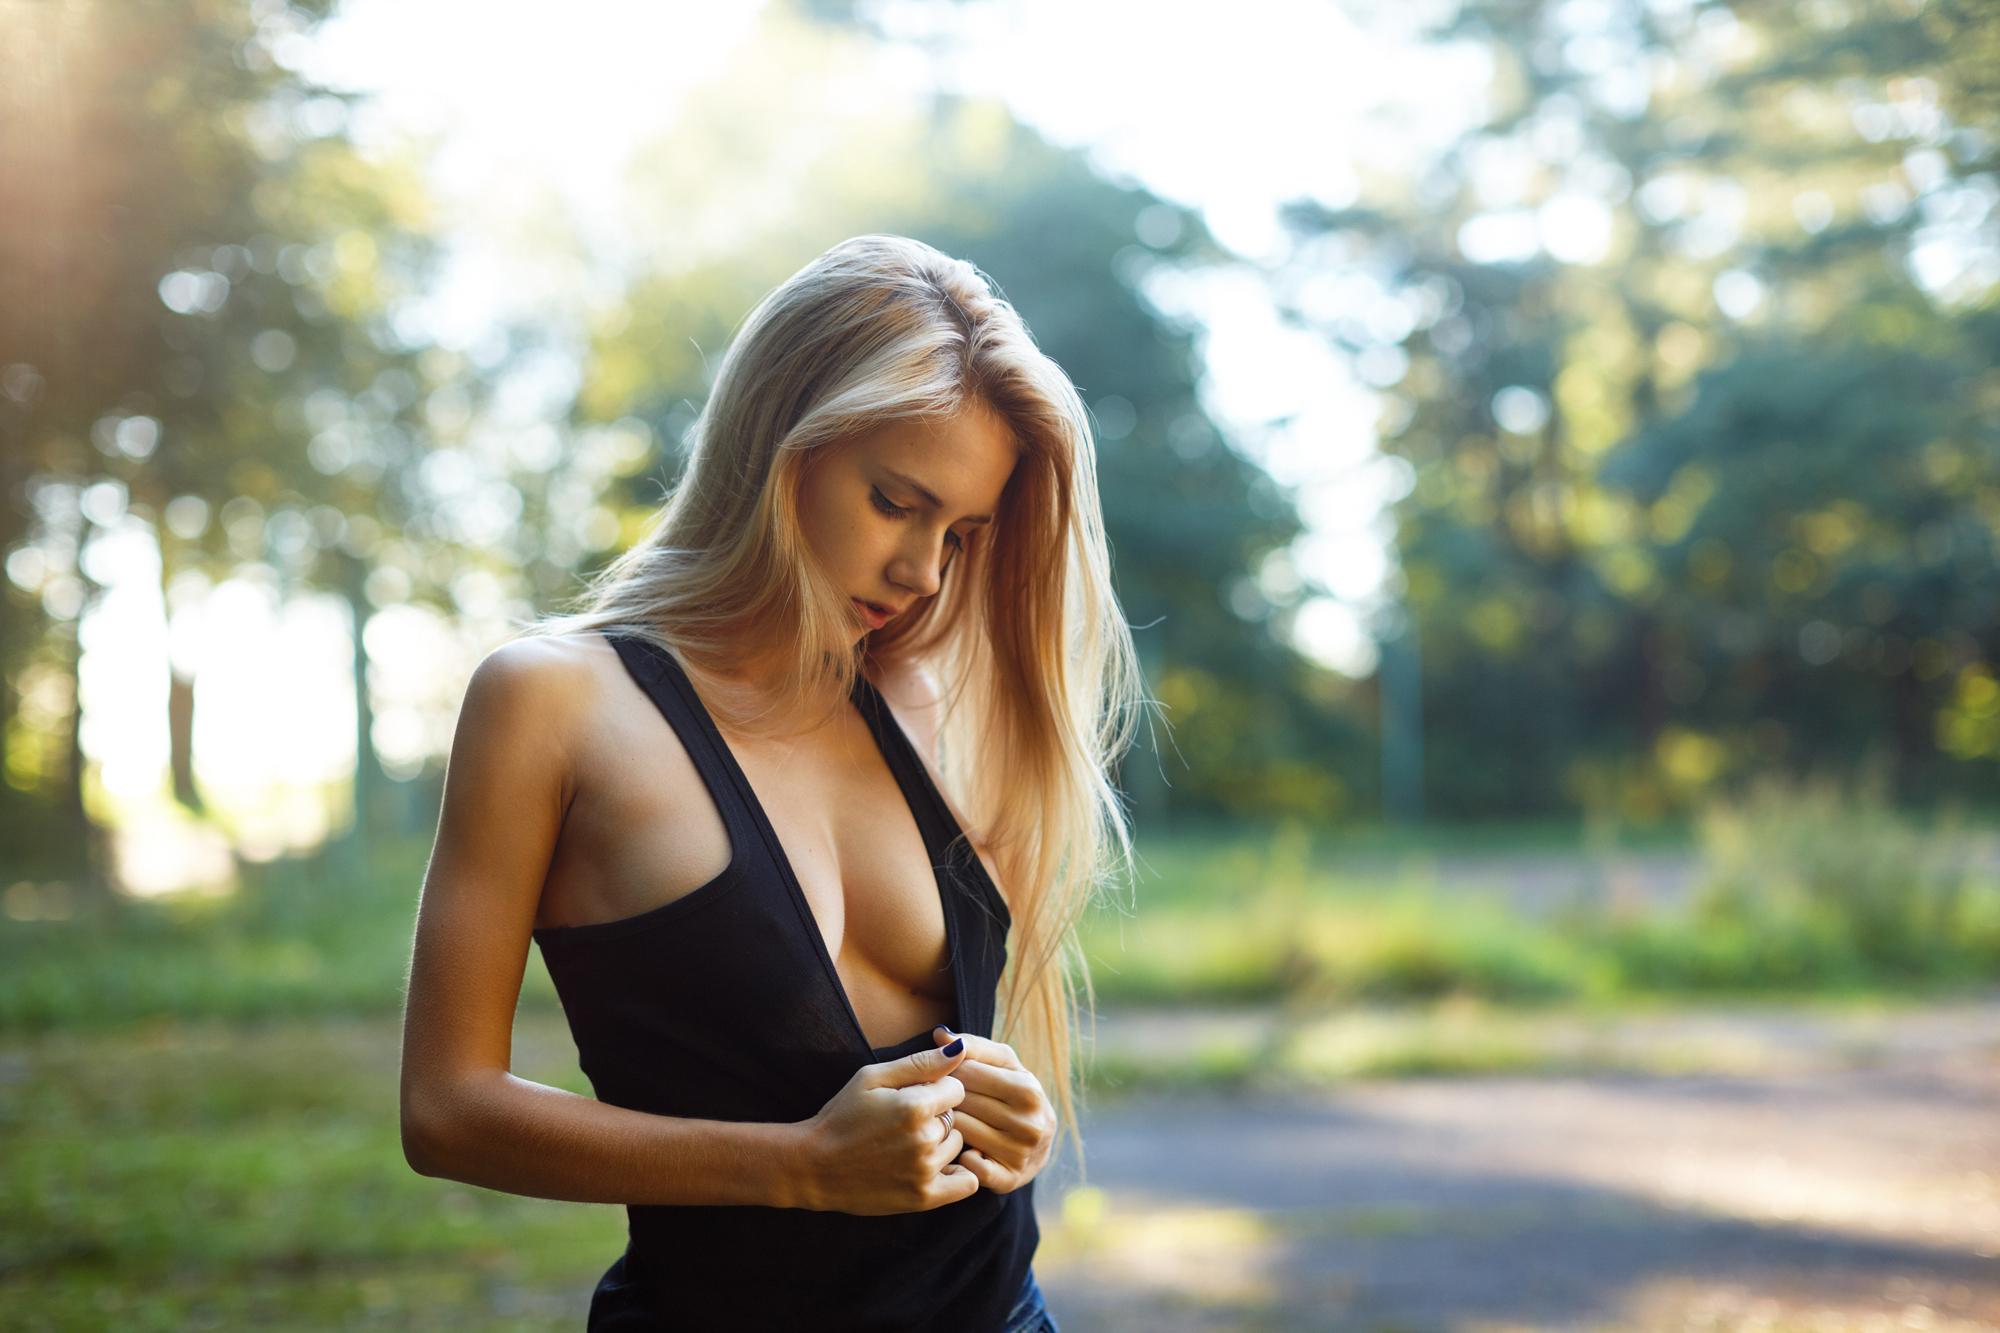 Cleavage Alena Podloznaya nudes (35 photos), Sexy, Cleavage, Instagram, panties 2018